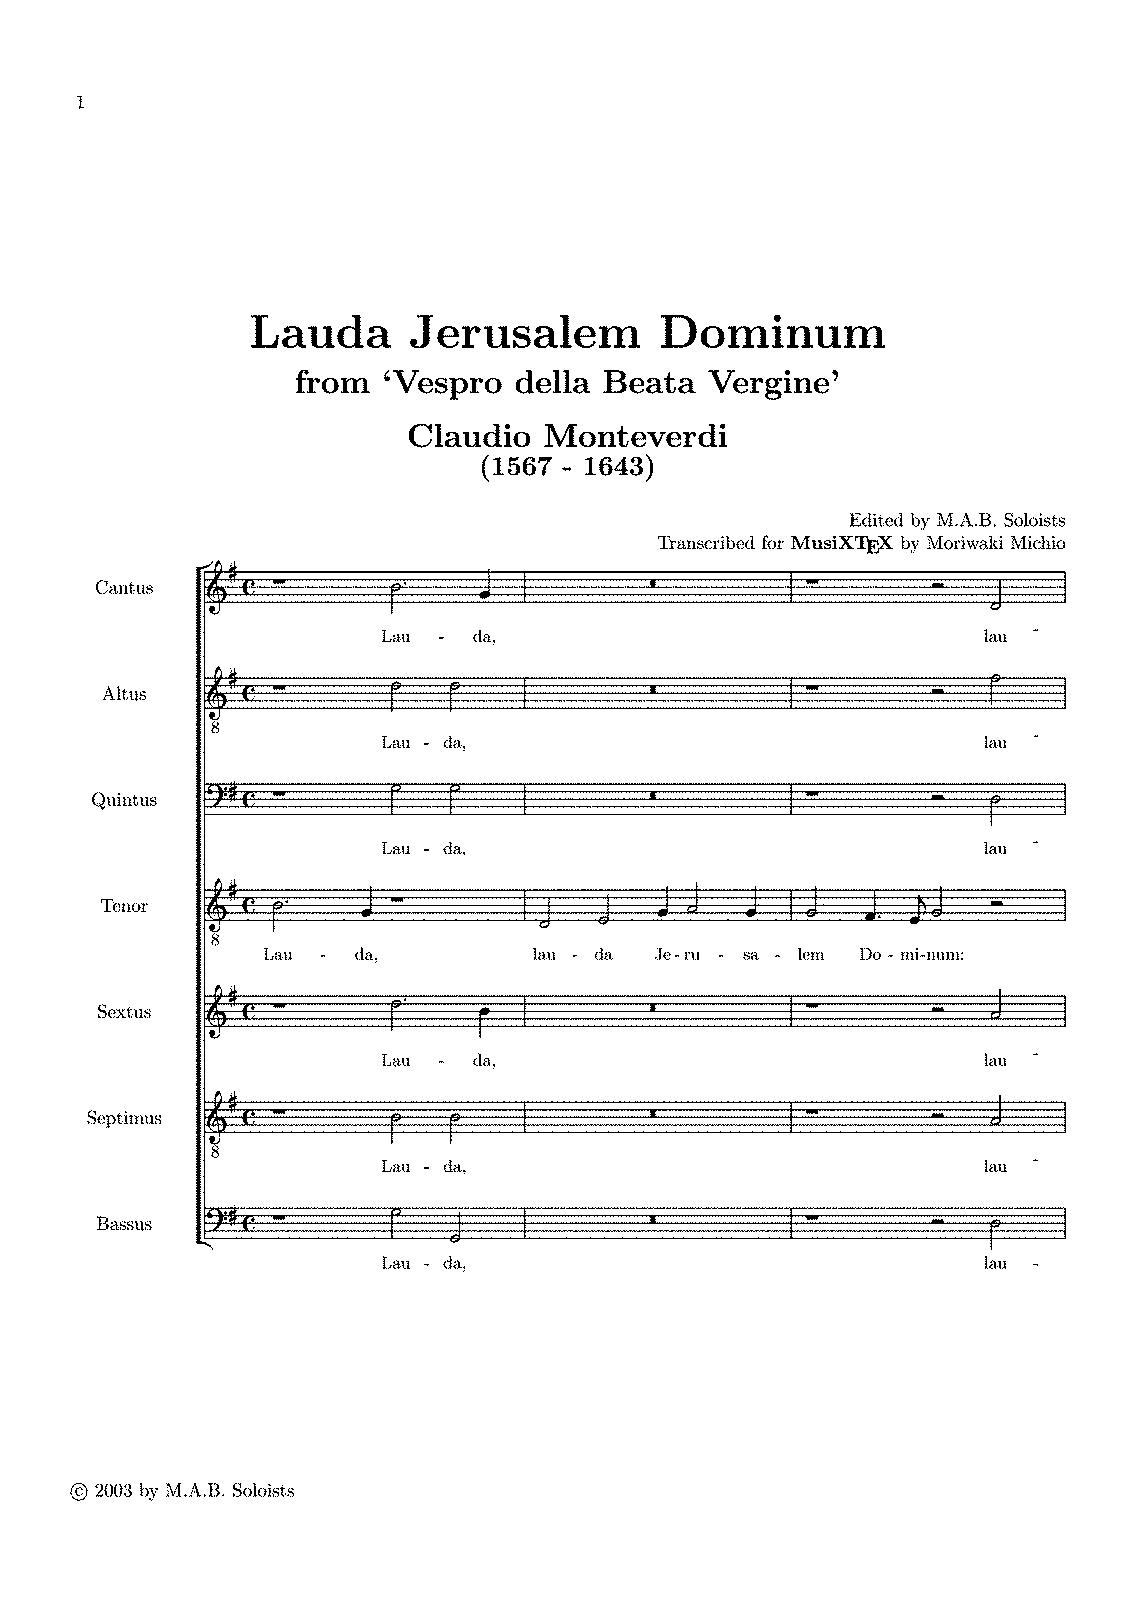 nigra sum lyrics